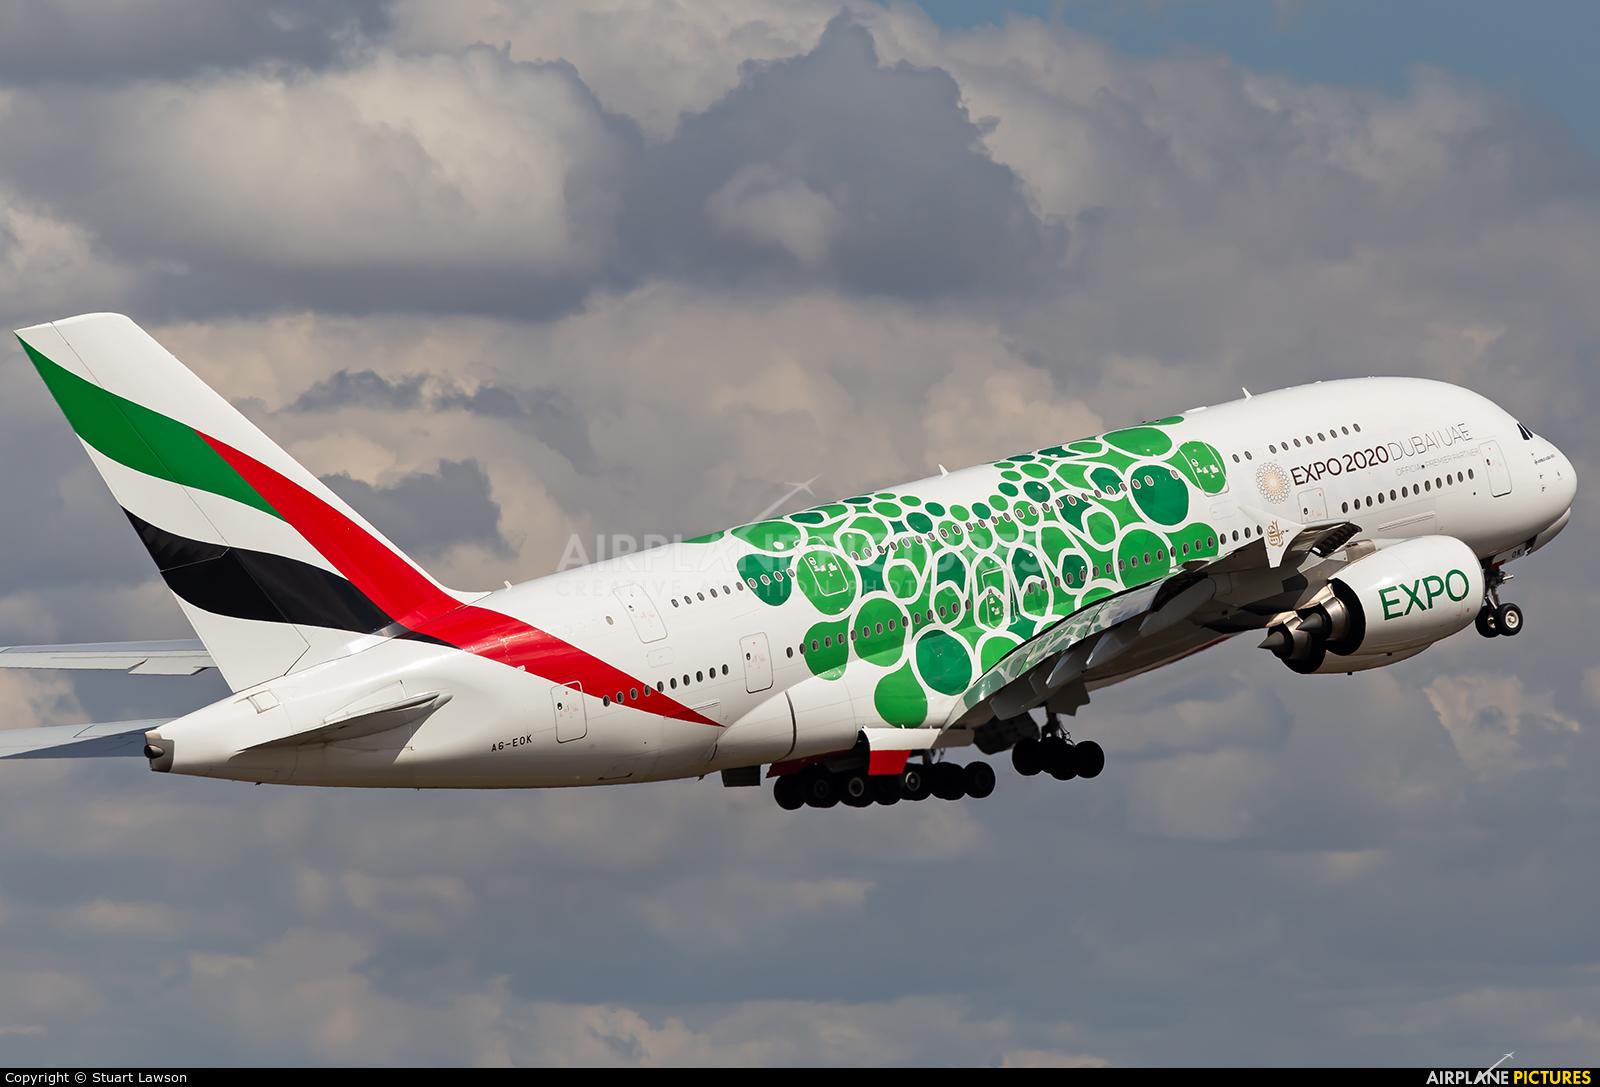 Emirates Airlines A6-EOK aircraft at Birmingham